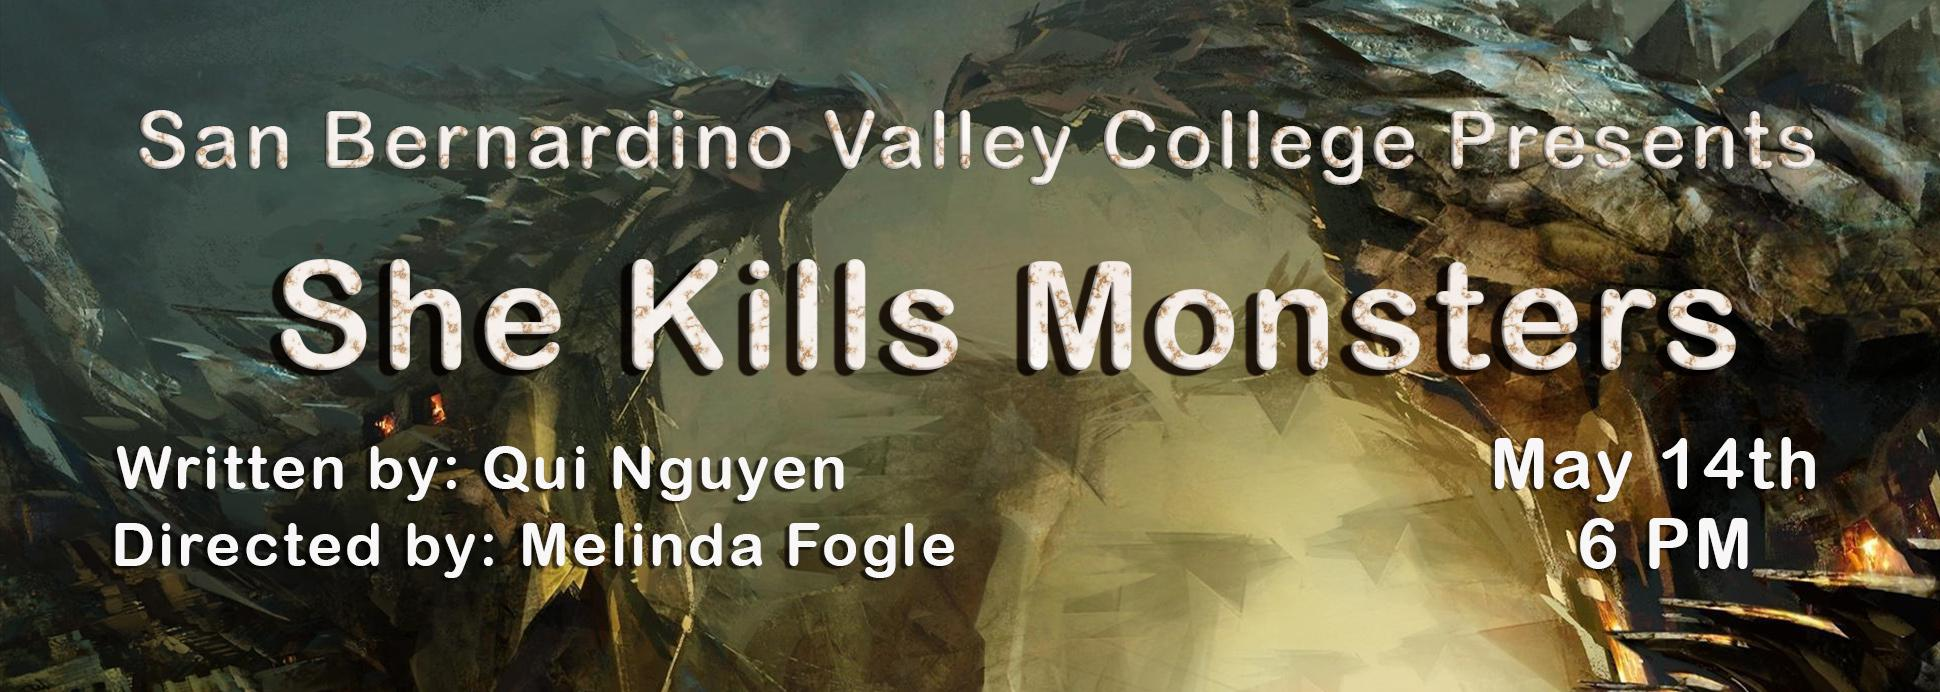 She Kills Monsters May 14th 6:00 PM